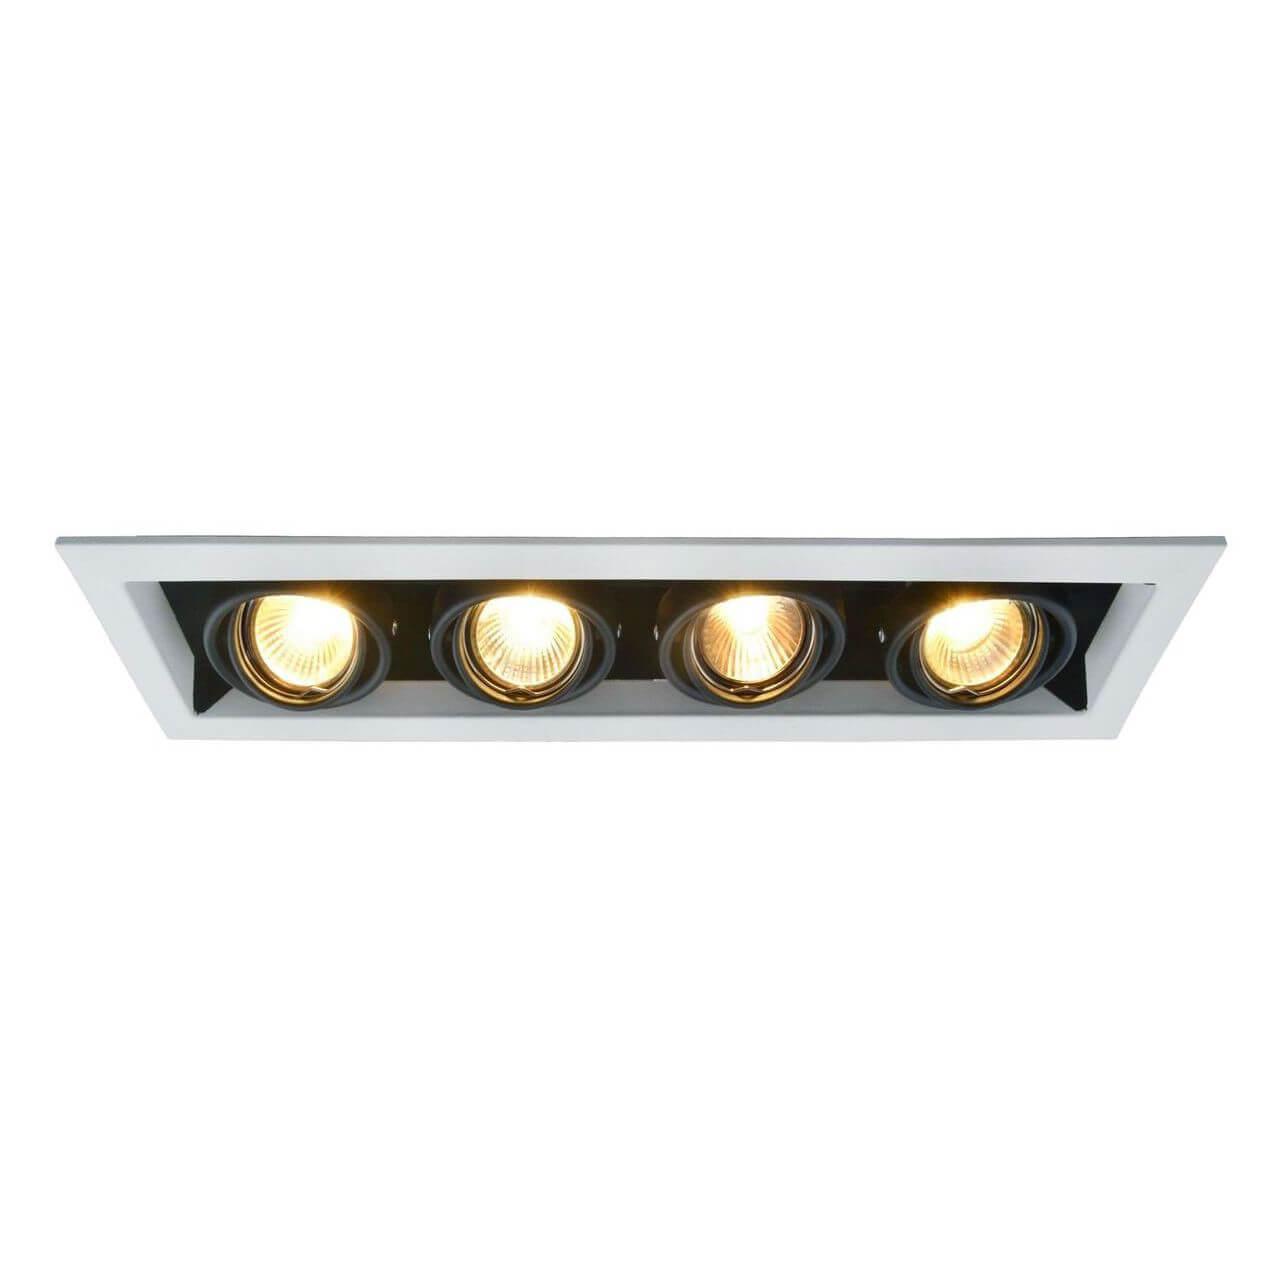 Светильник Arte Lamp A5941PL-4WH Cardani White цена 2017